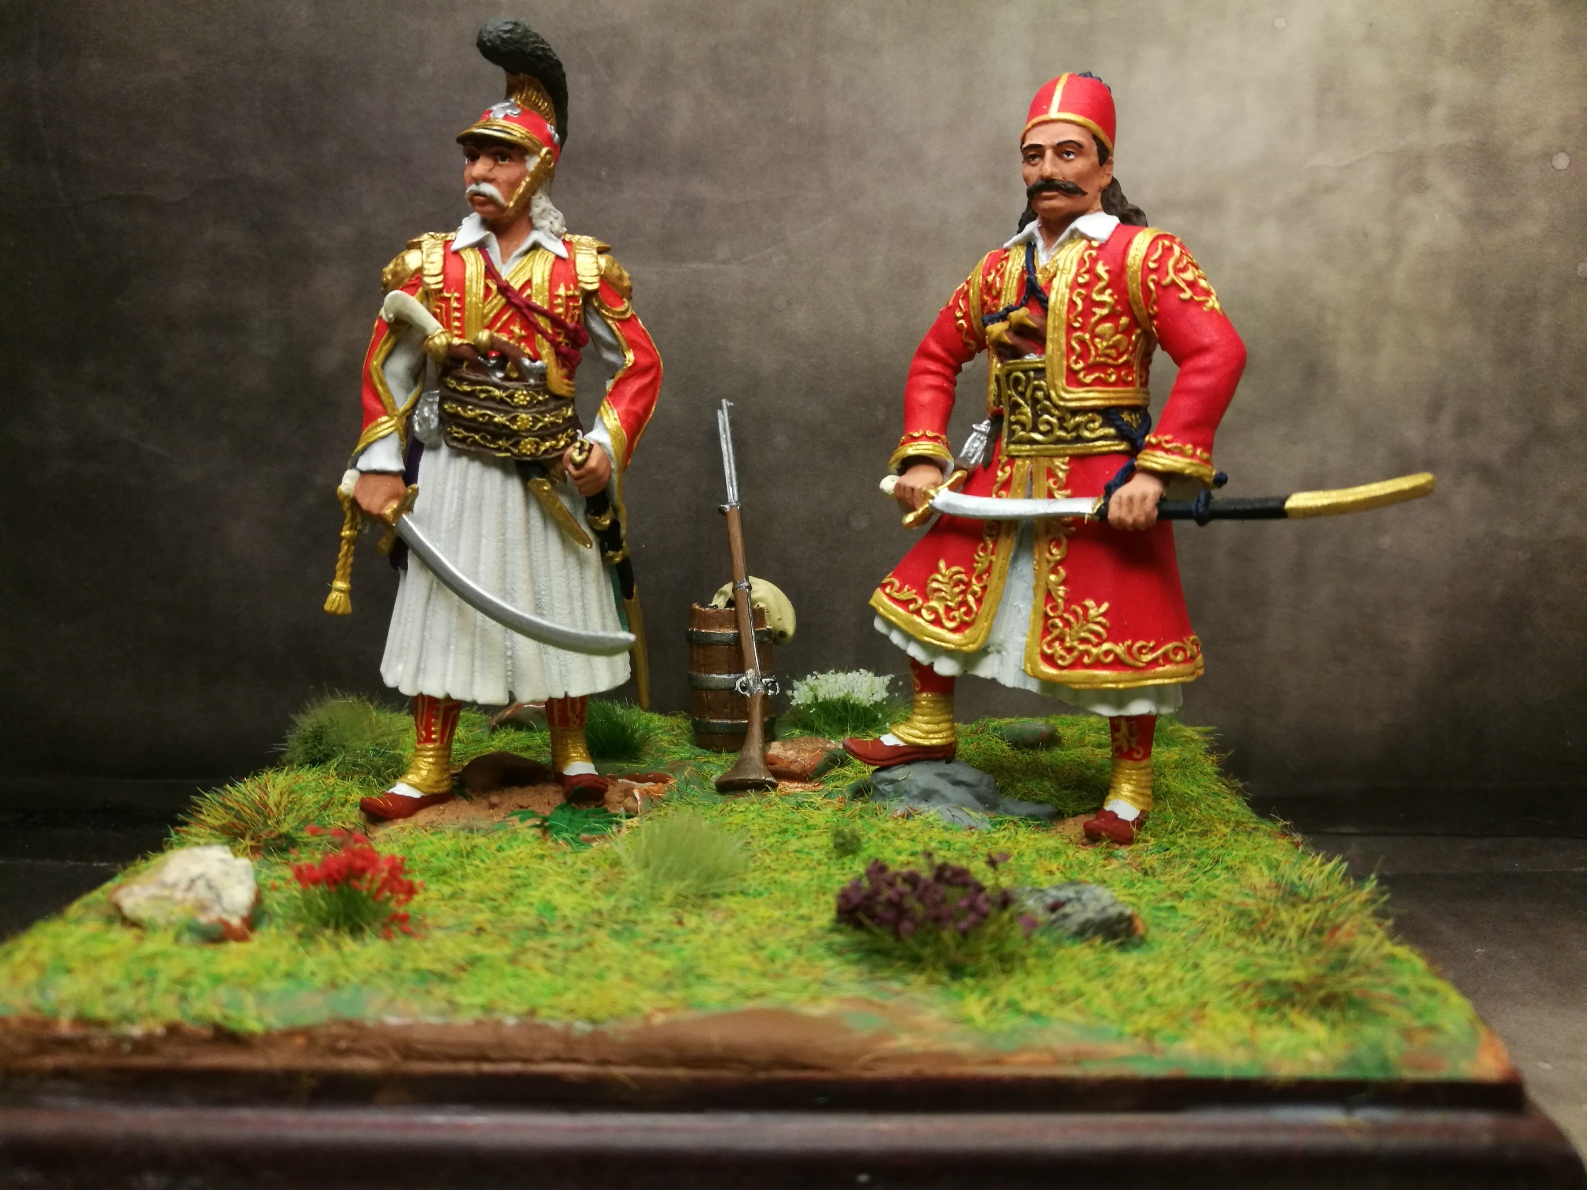 1821 , Kolokotronis, Karaiskakis, the two generals